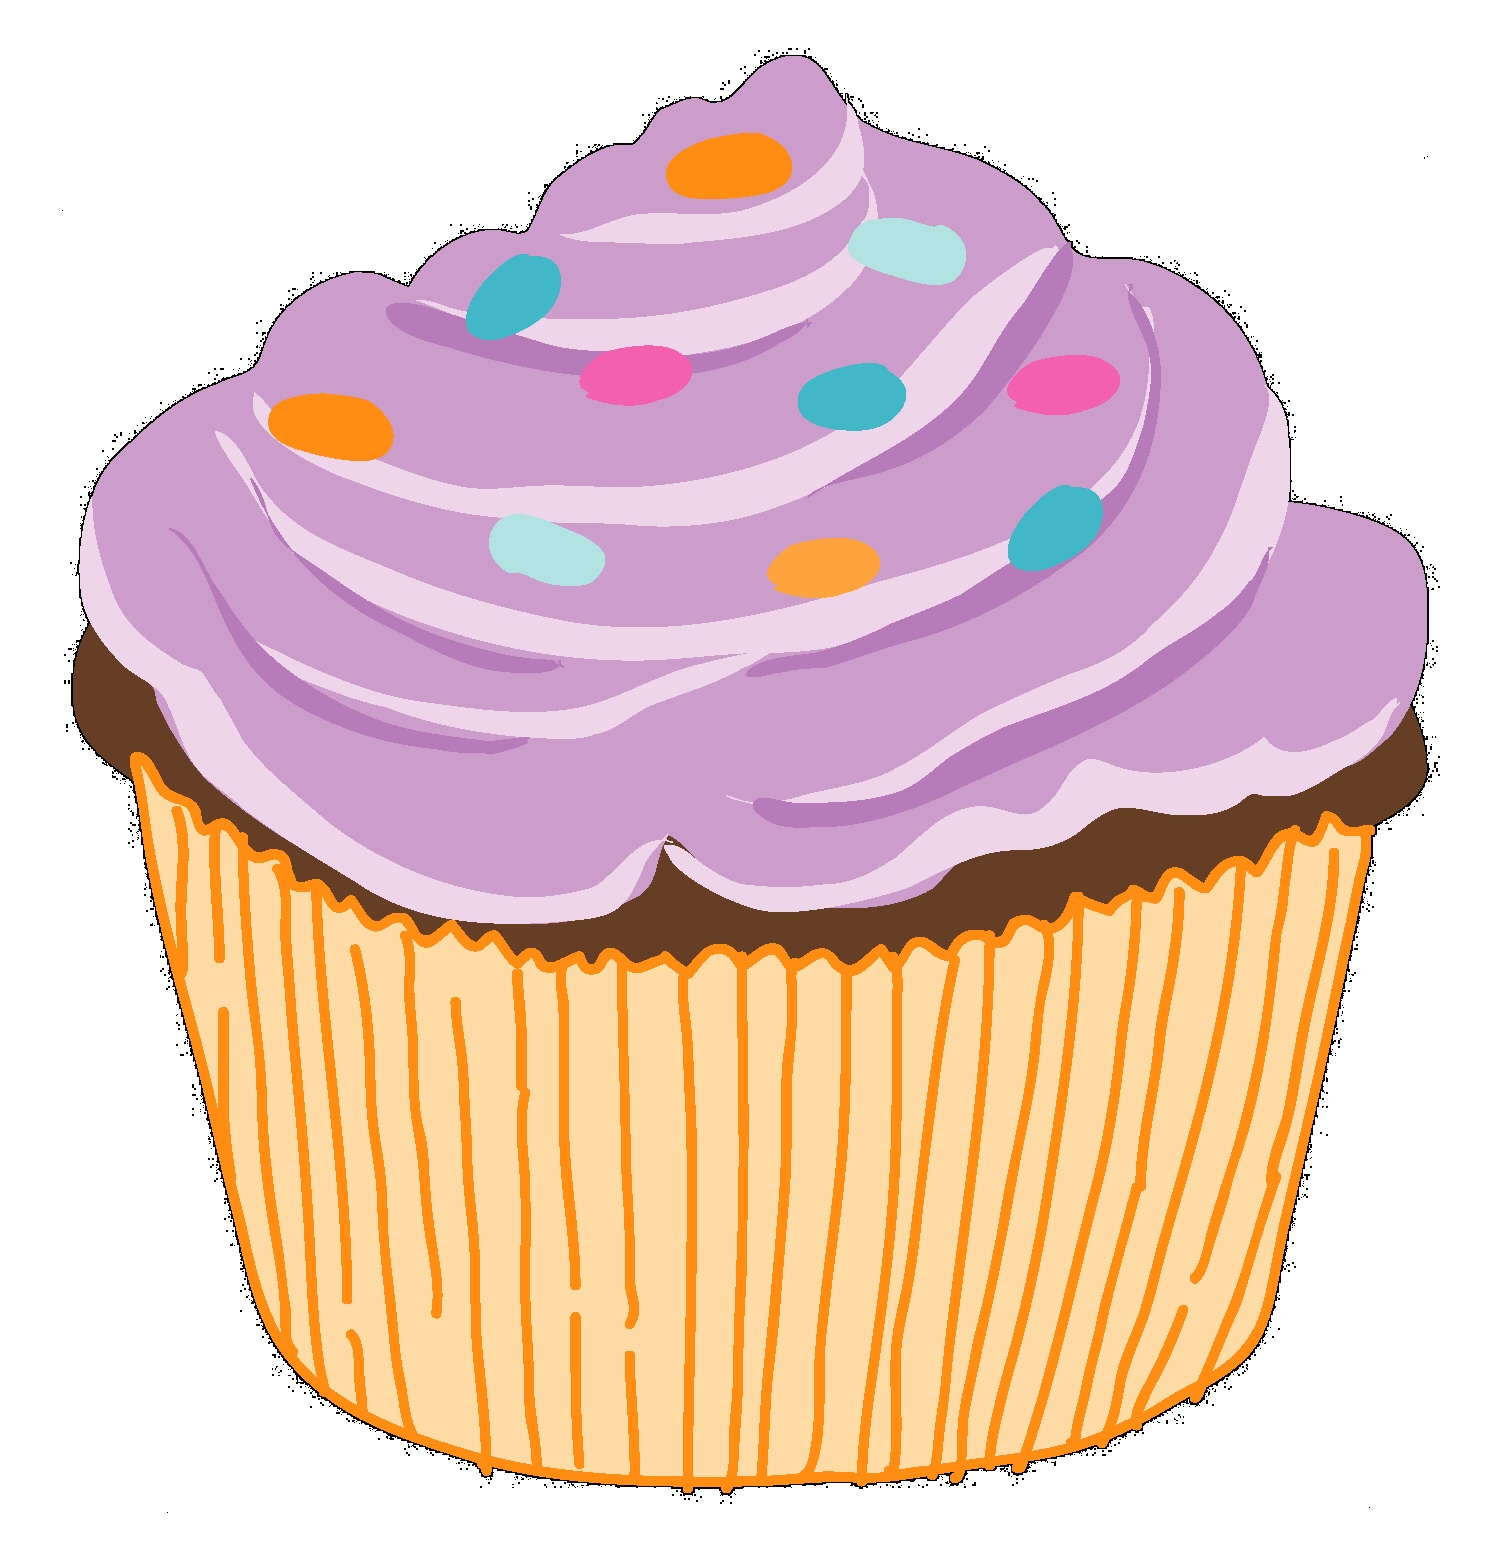 clip art royalty free download Free cupcake cliparts download. Cupcakes clipart.